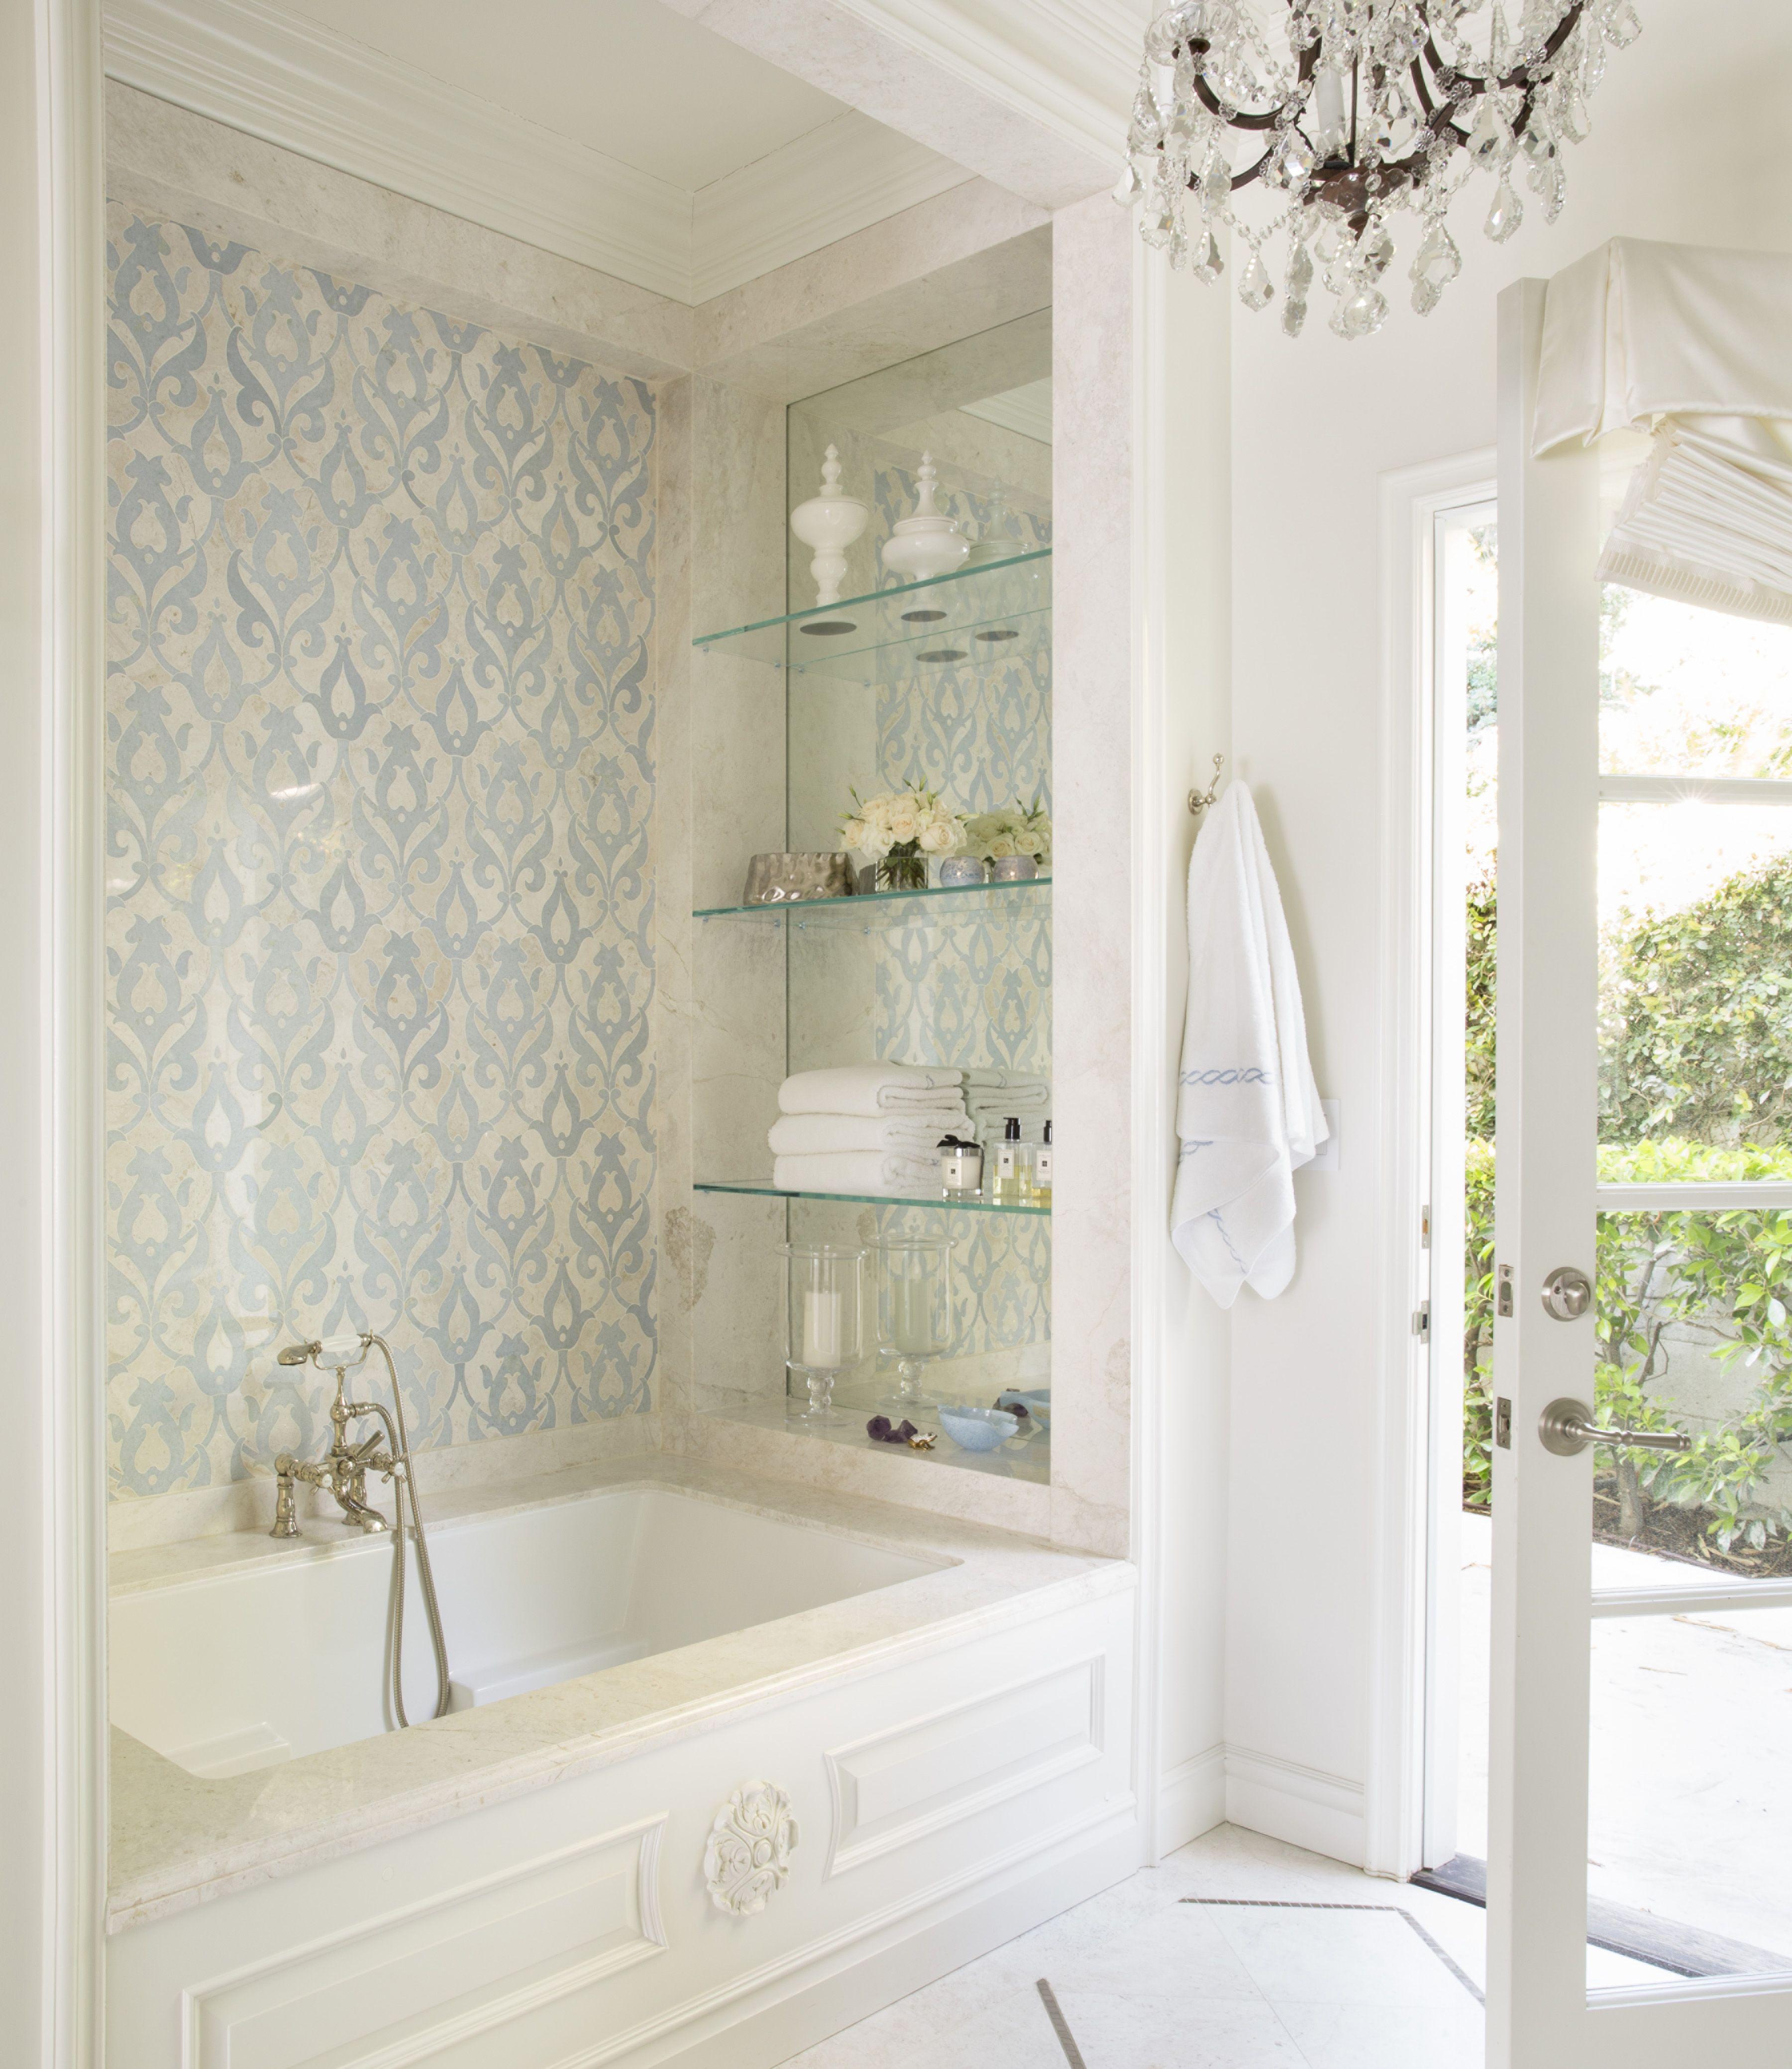 Gorgeous Bathtub Backsplash Design Sfa Design